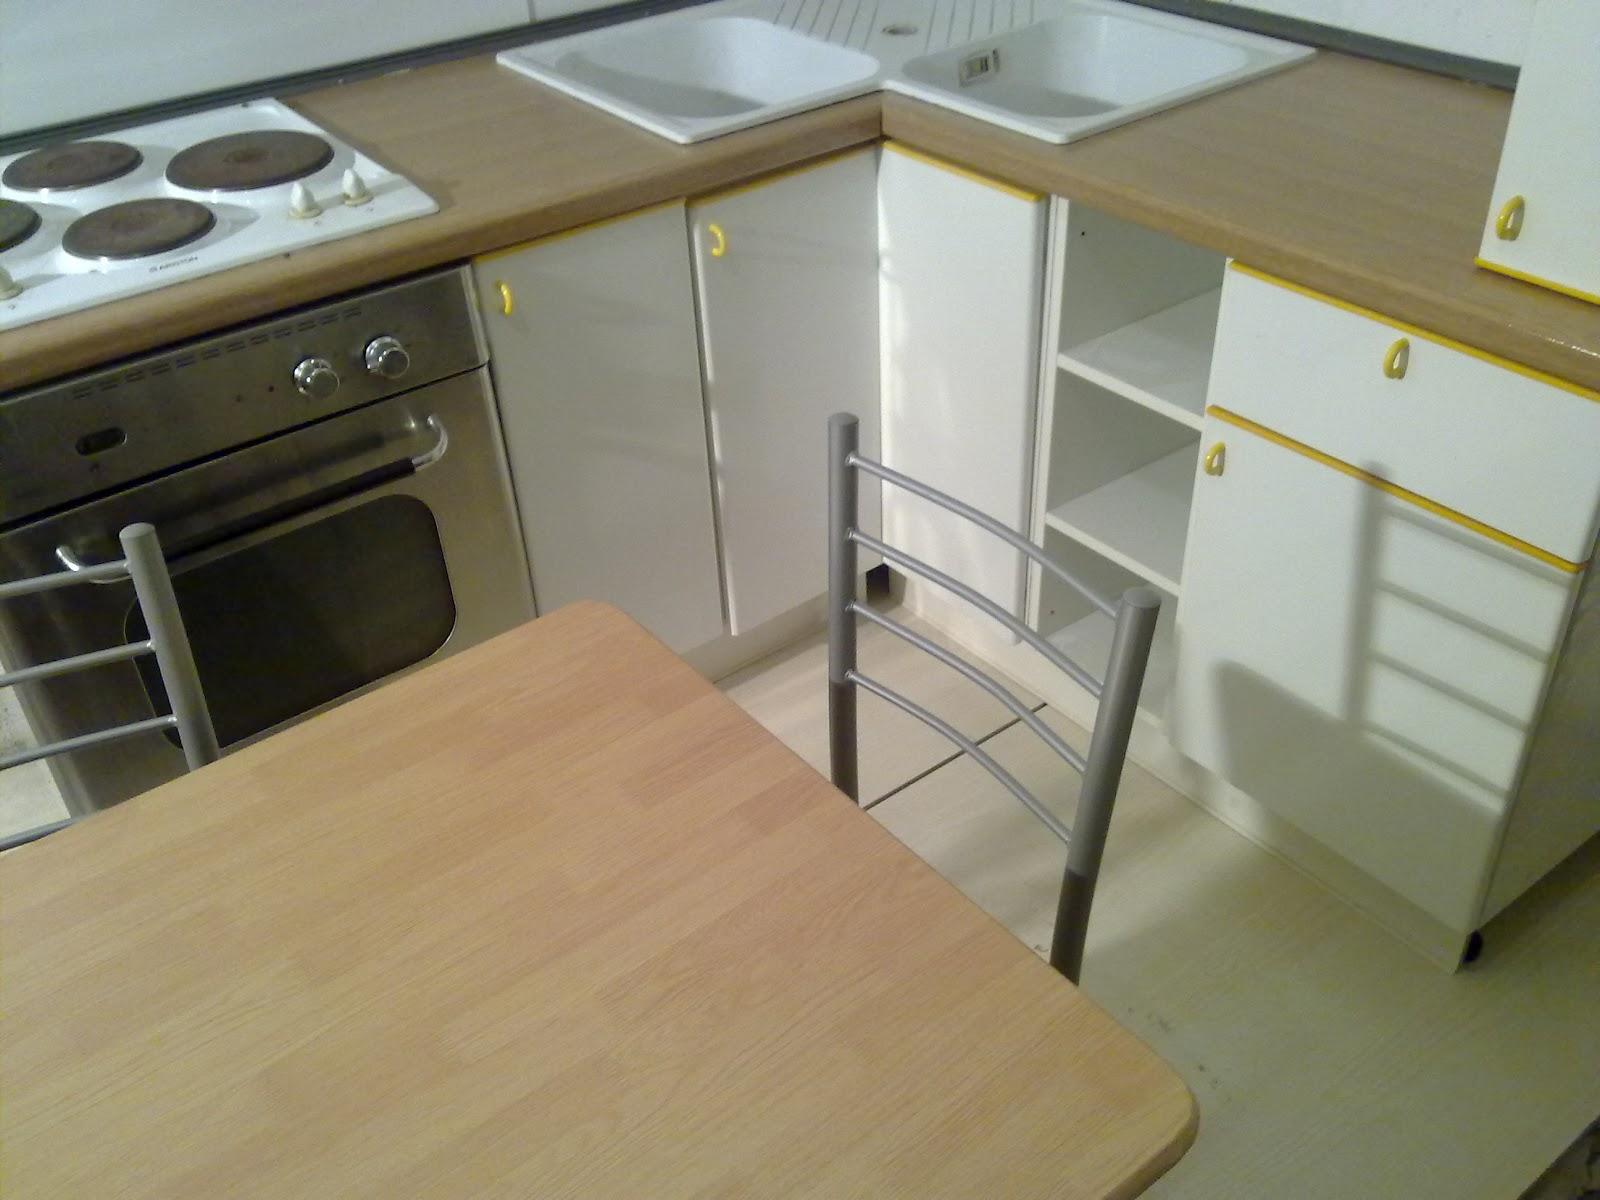 Arredamento casa usato amazing arredamento bologna mobili for Arredamento usato subito napoli